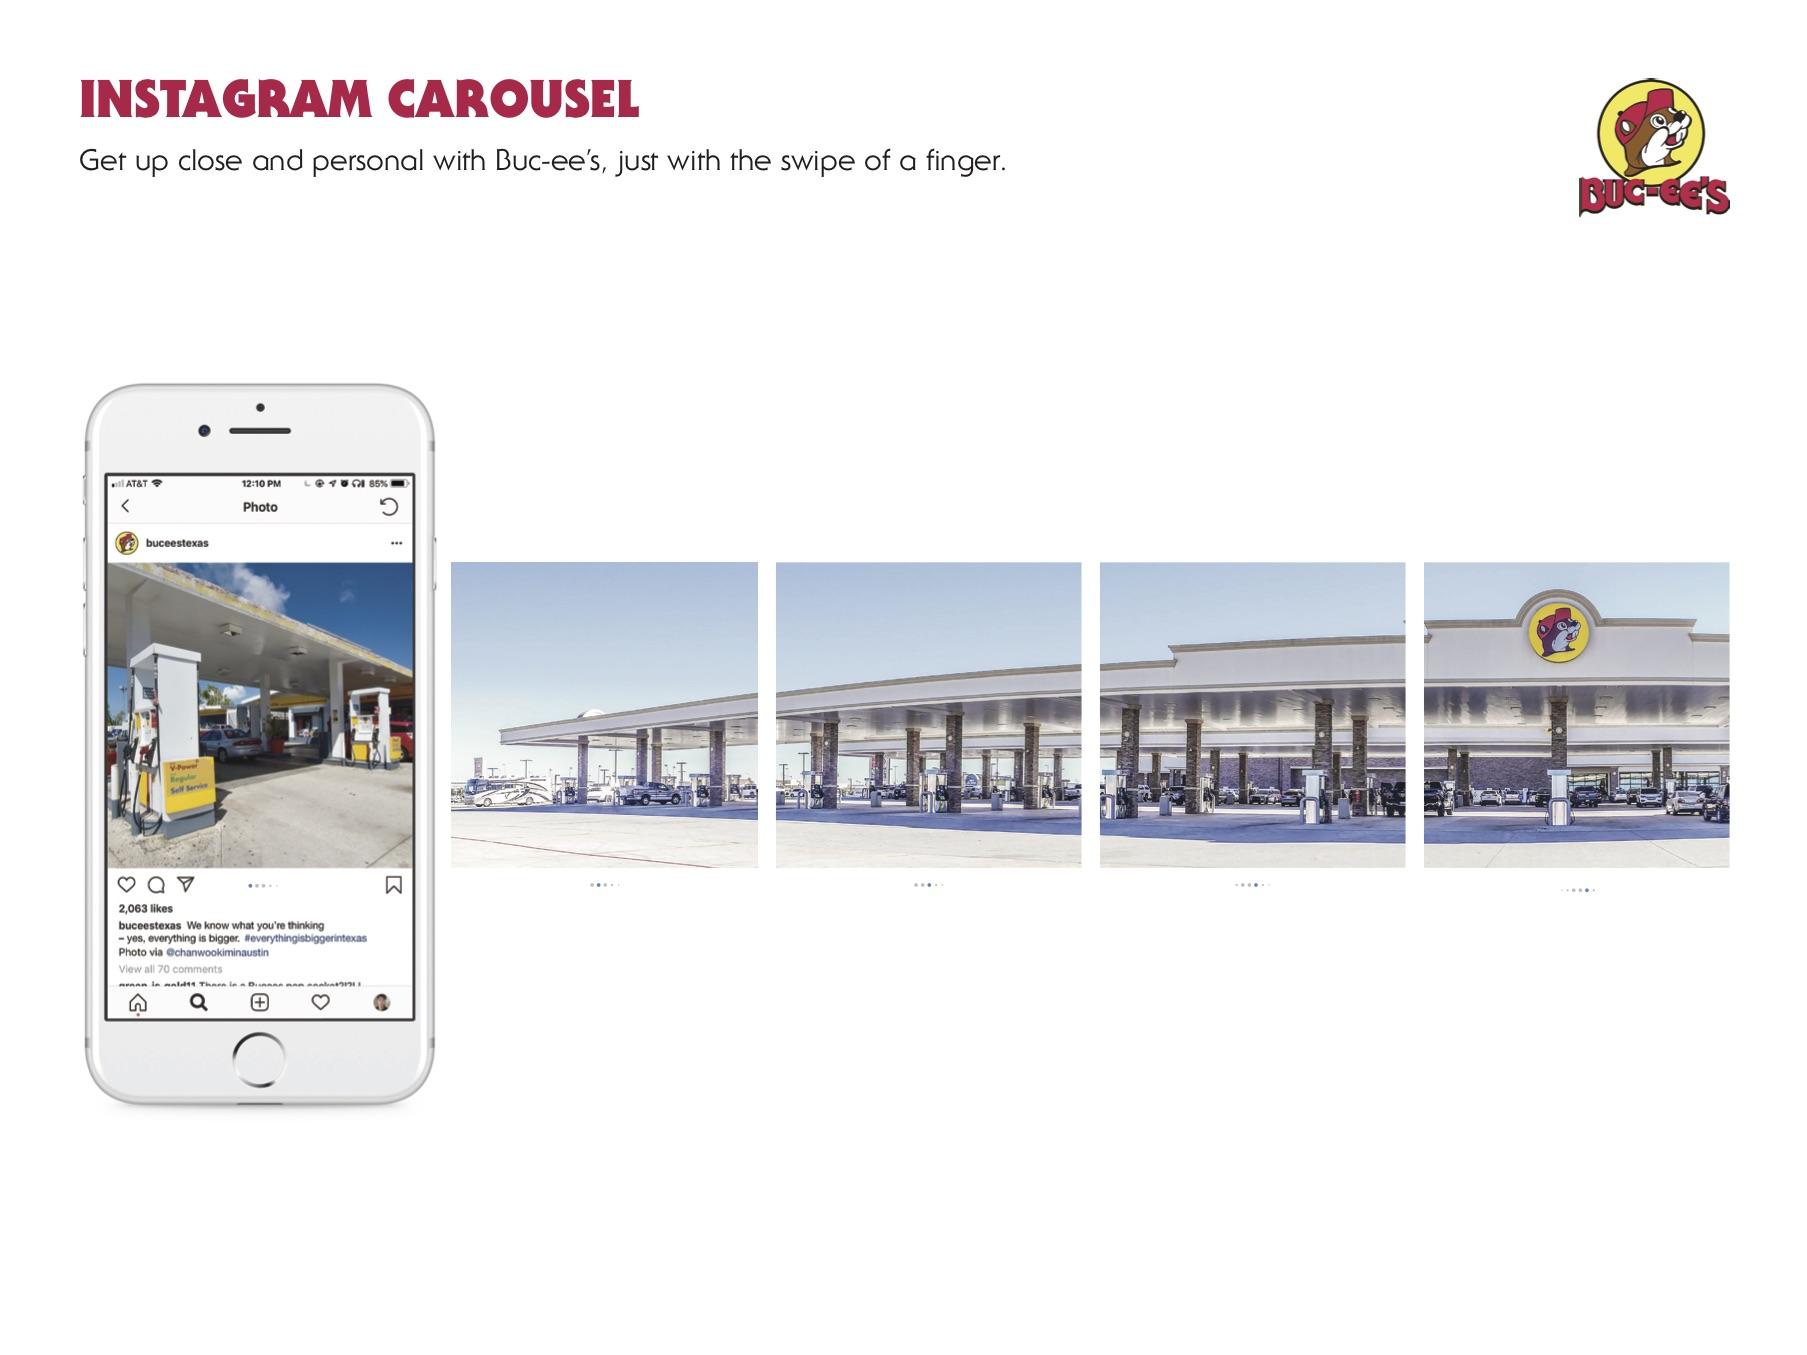 Buc-ee's Instagram Carousel.jpg